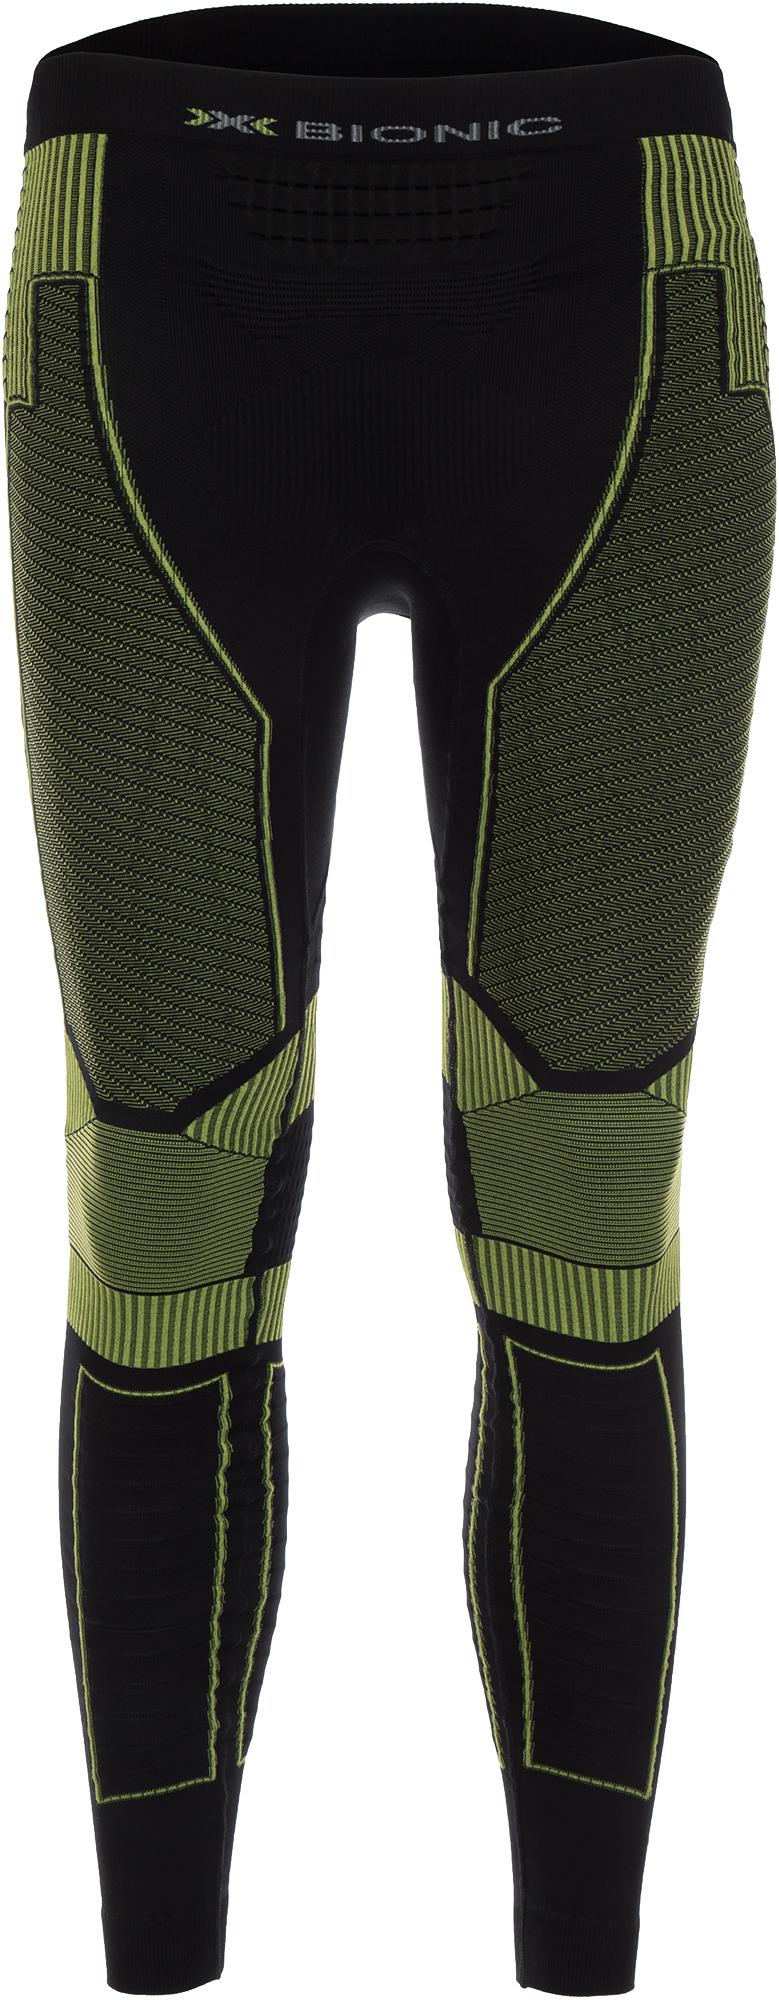 X-Bionic Тайтсы мужские X-Bionic Effector Power Ow, размер 52 цена 2017